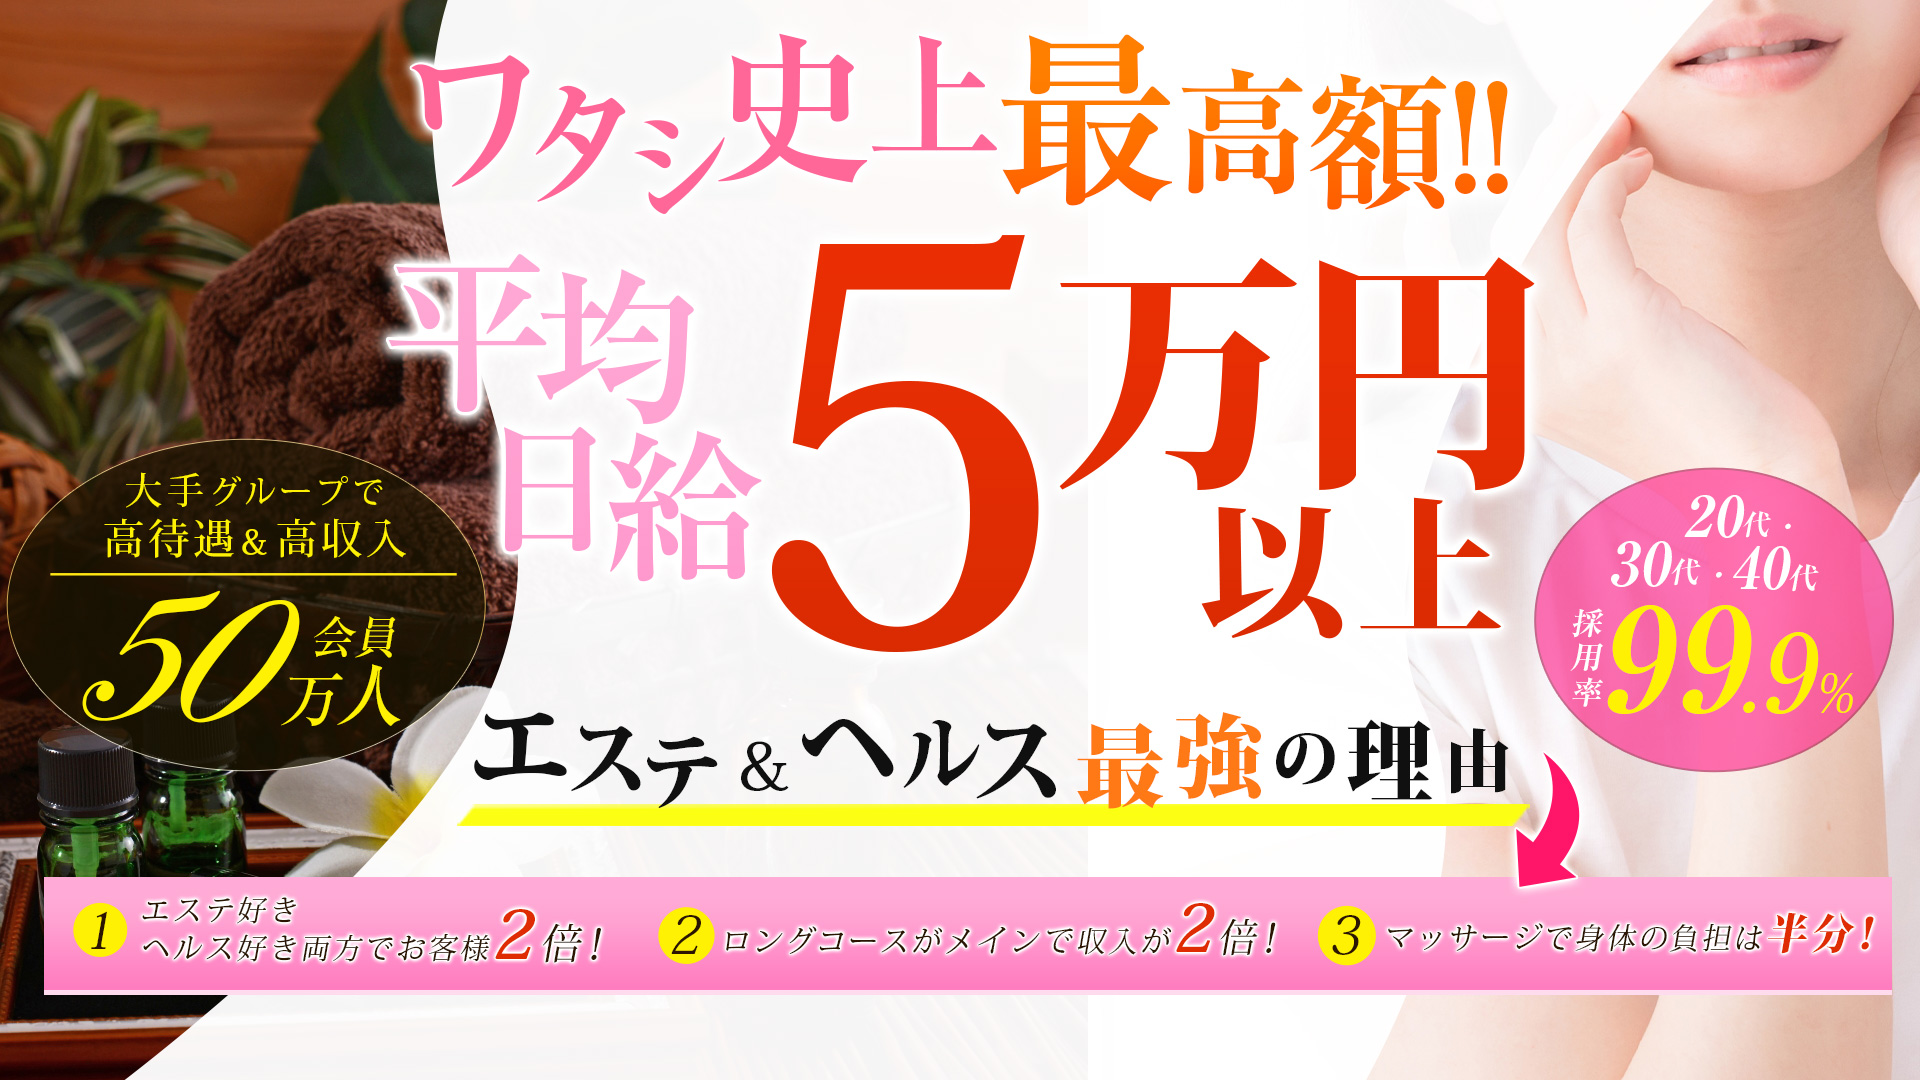 MSC妄想紳士倶楽部 鶯谷店の求人画像